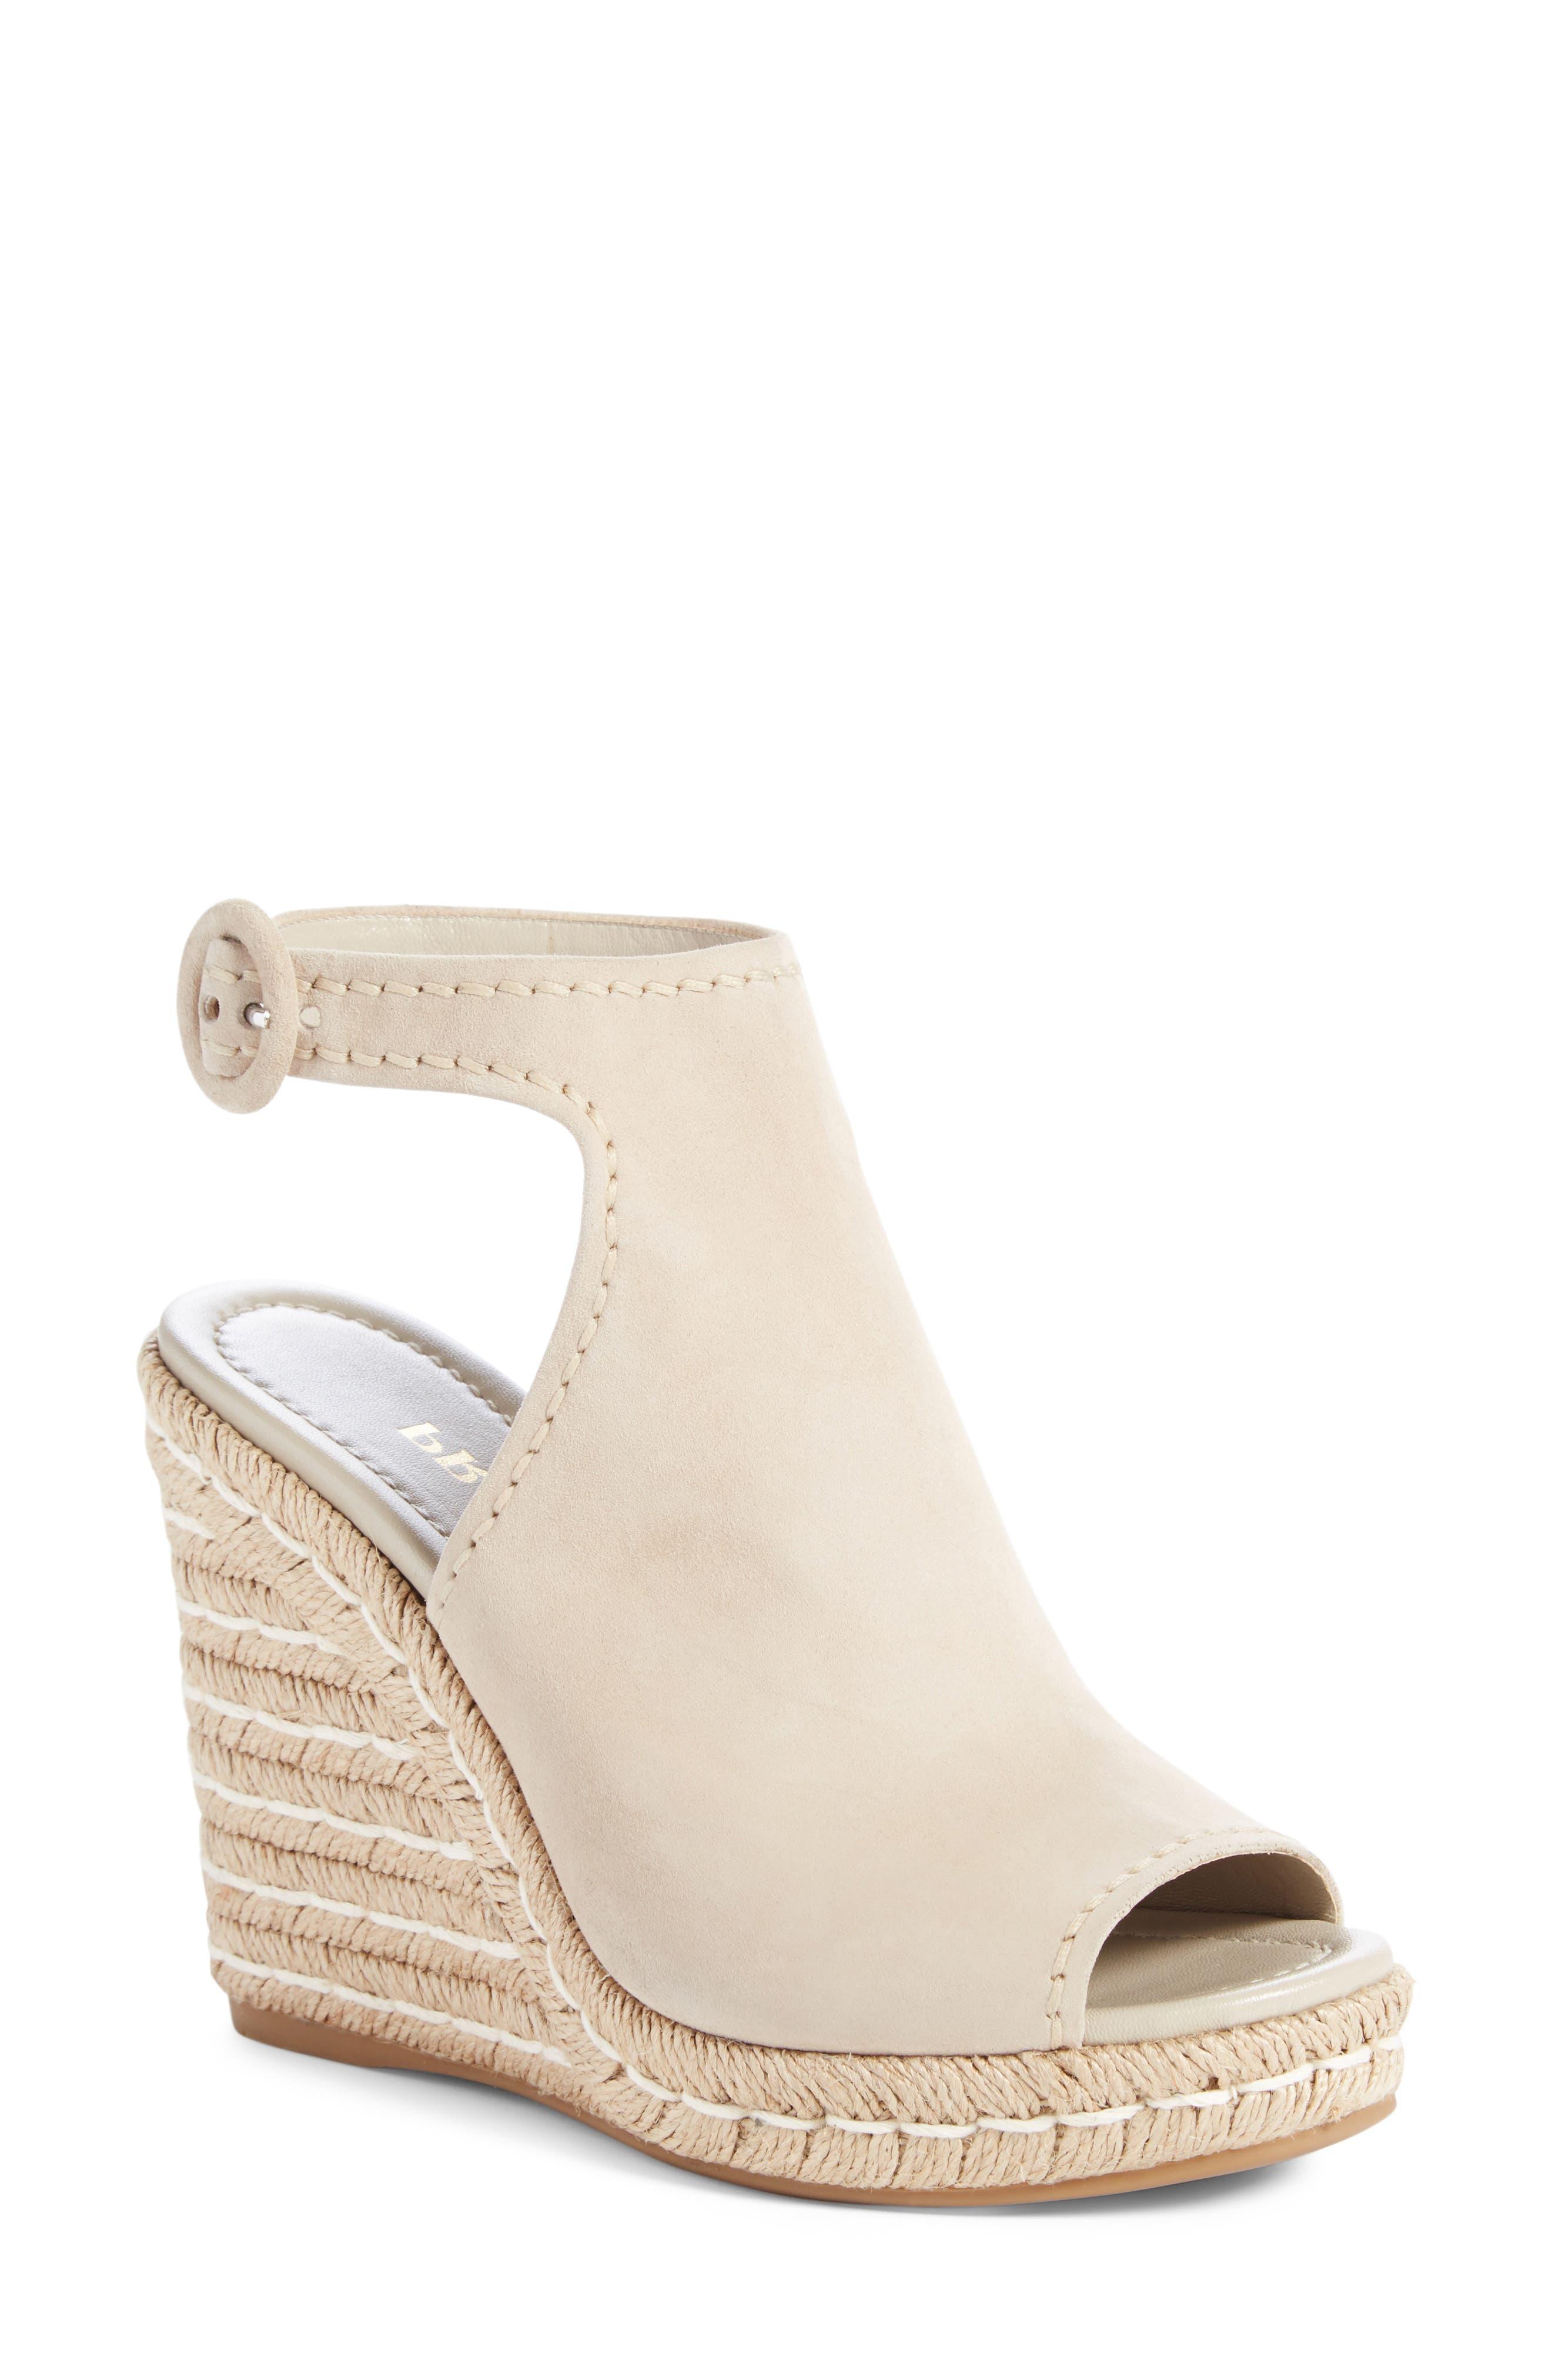 Ankle Strap Espadrille Wedge Sandal,                         Main,                         color, Beige